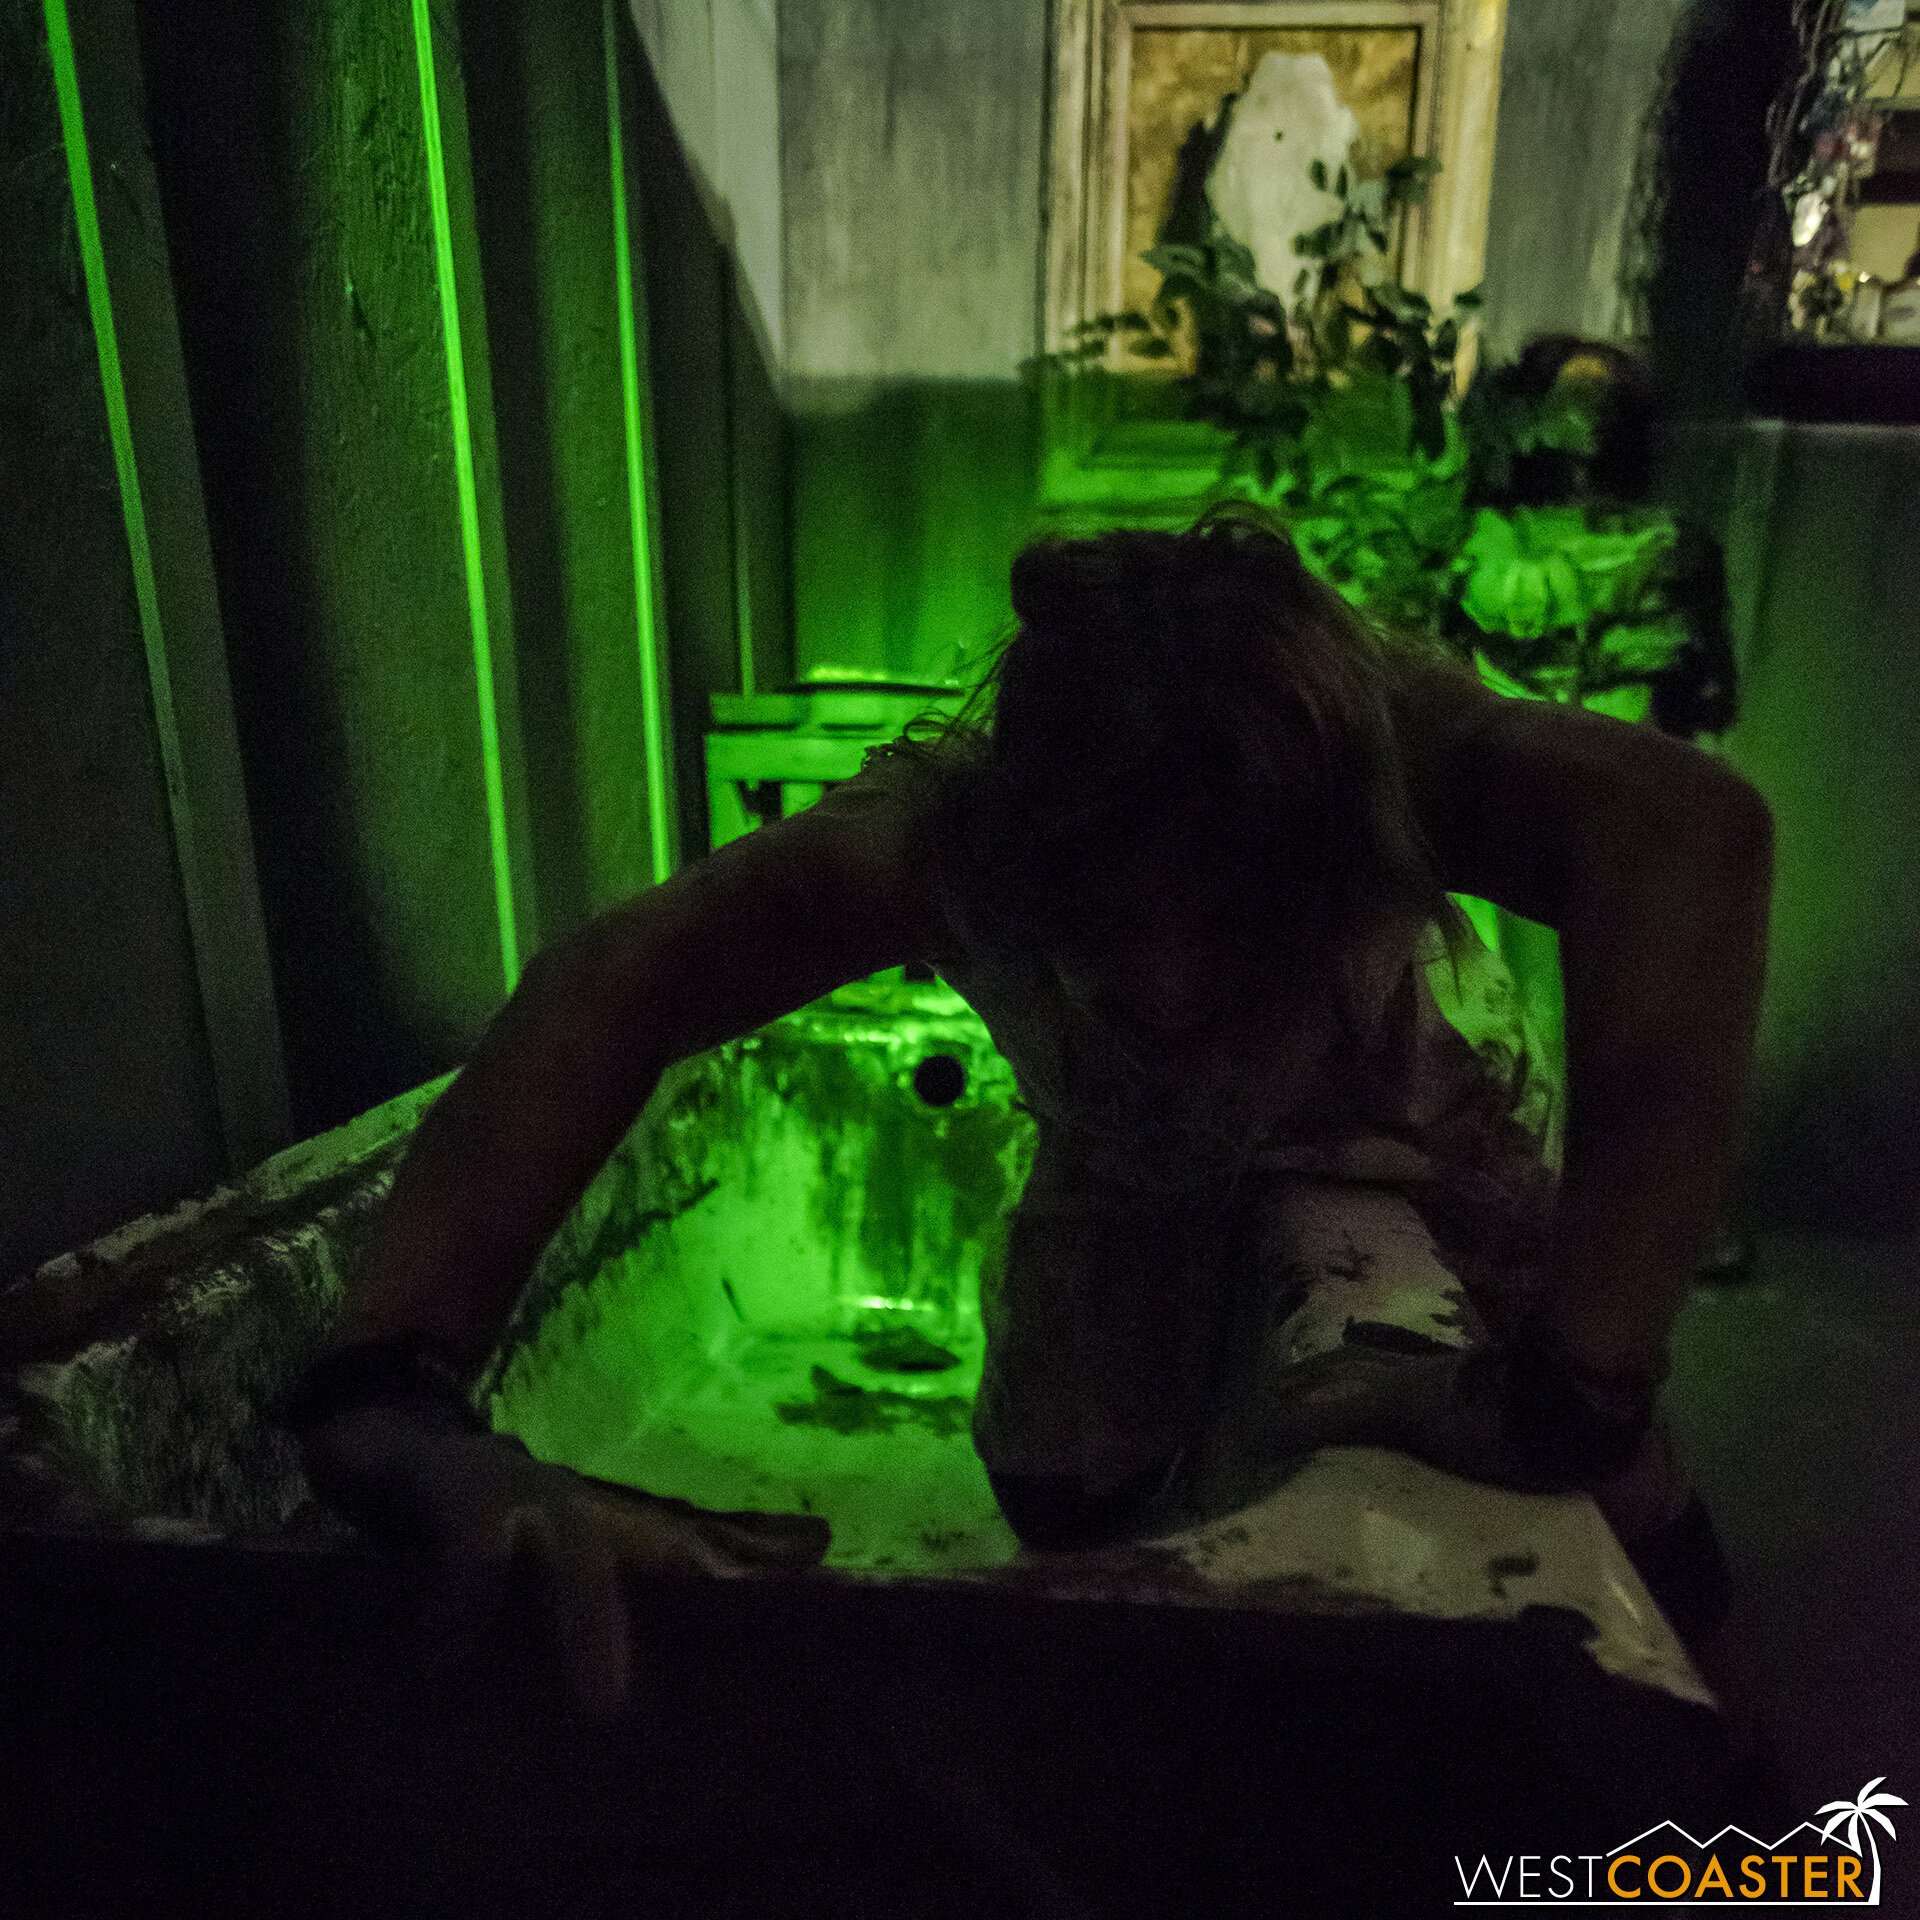 HauntedHotel-19_1010-D-KillbillyChaos-0003.jpg